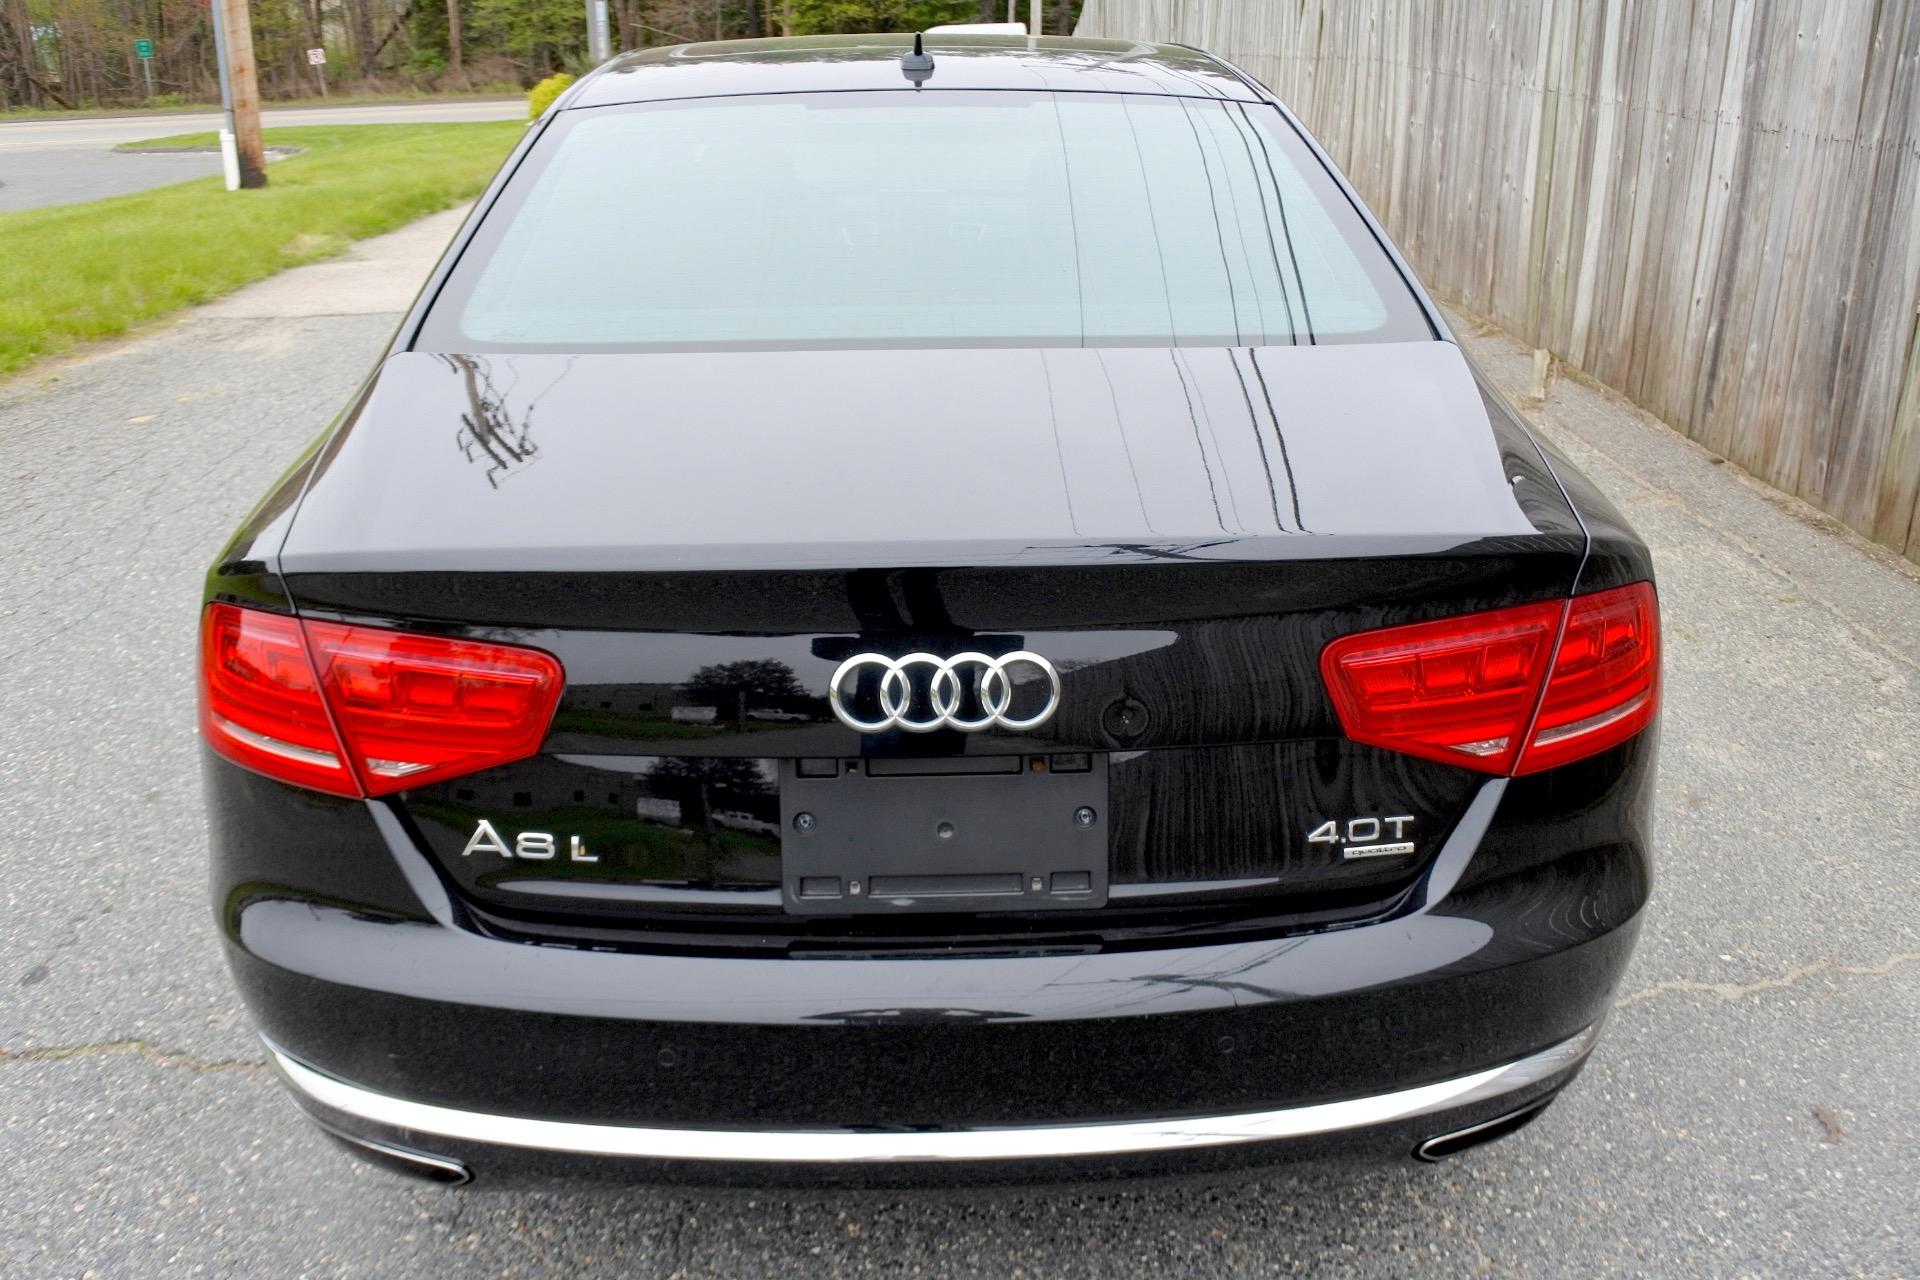 Used 2013 Audi A8 l 4.0L Quattro Used 2013 Audi A8 l 4.0L Quattro for sale  at Metro West Motorcars LLC in Shrewsbury MA 4